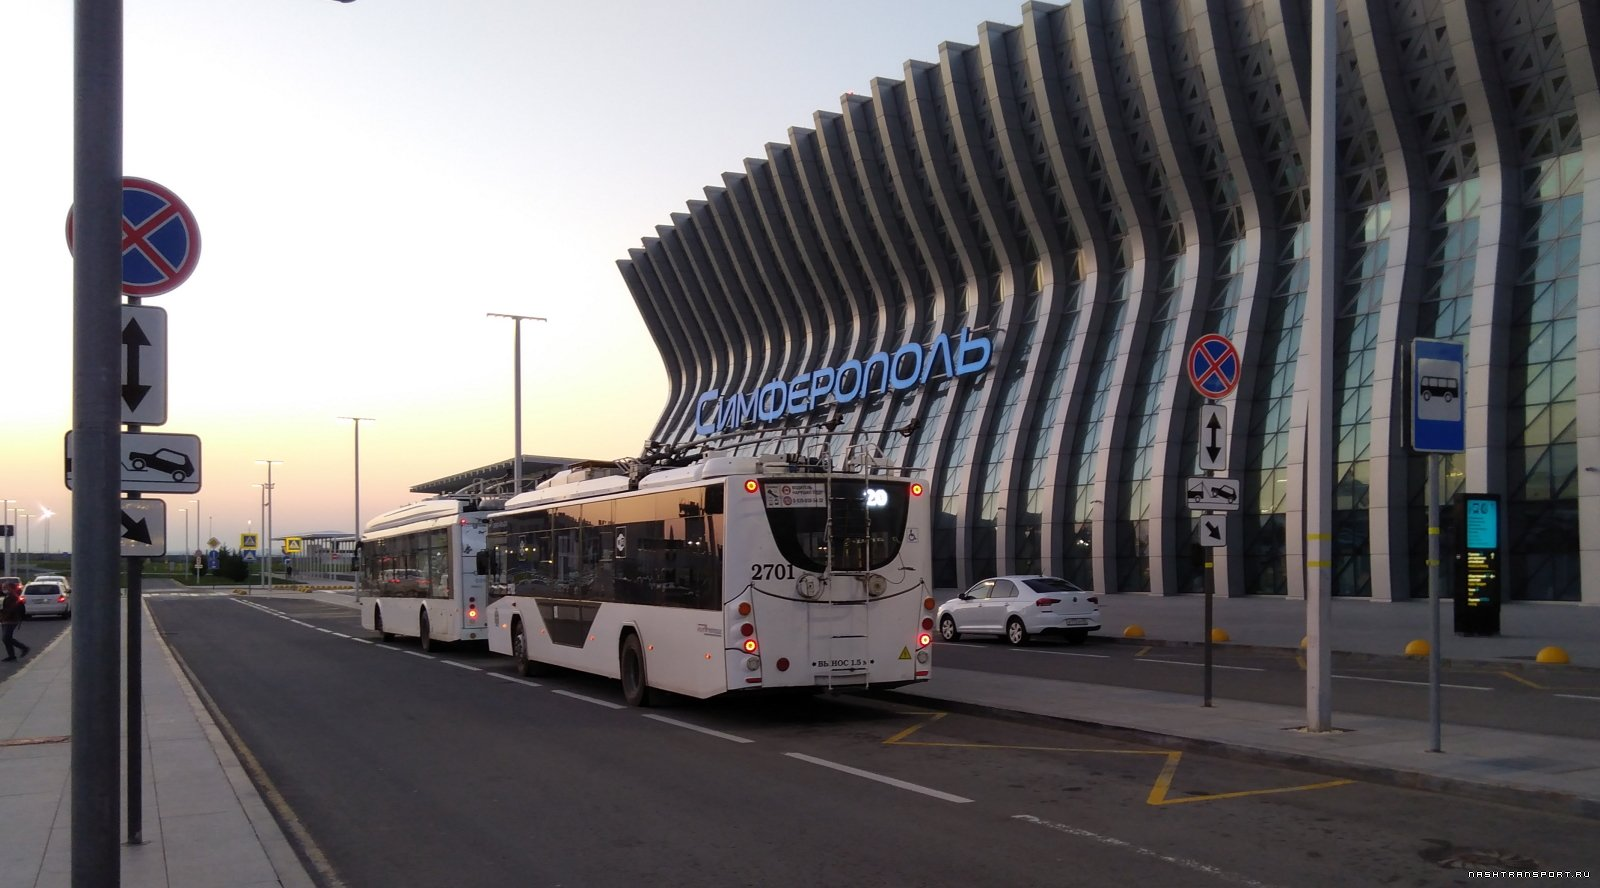 1уу. Троллейбусы.